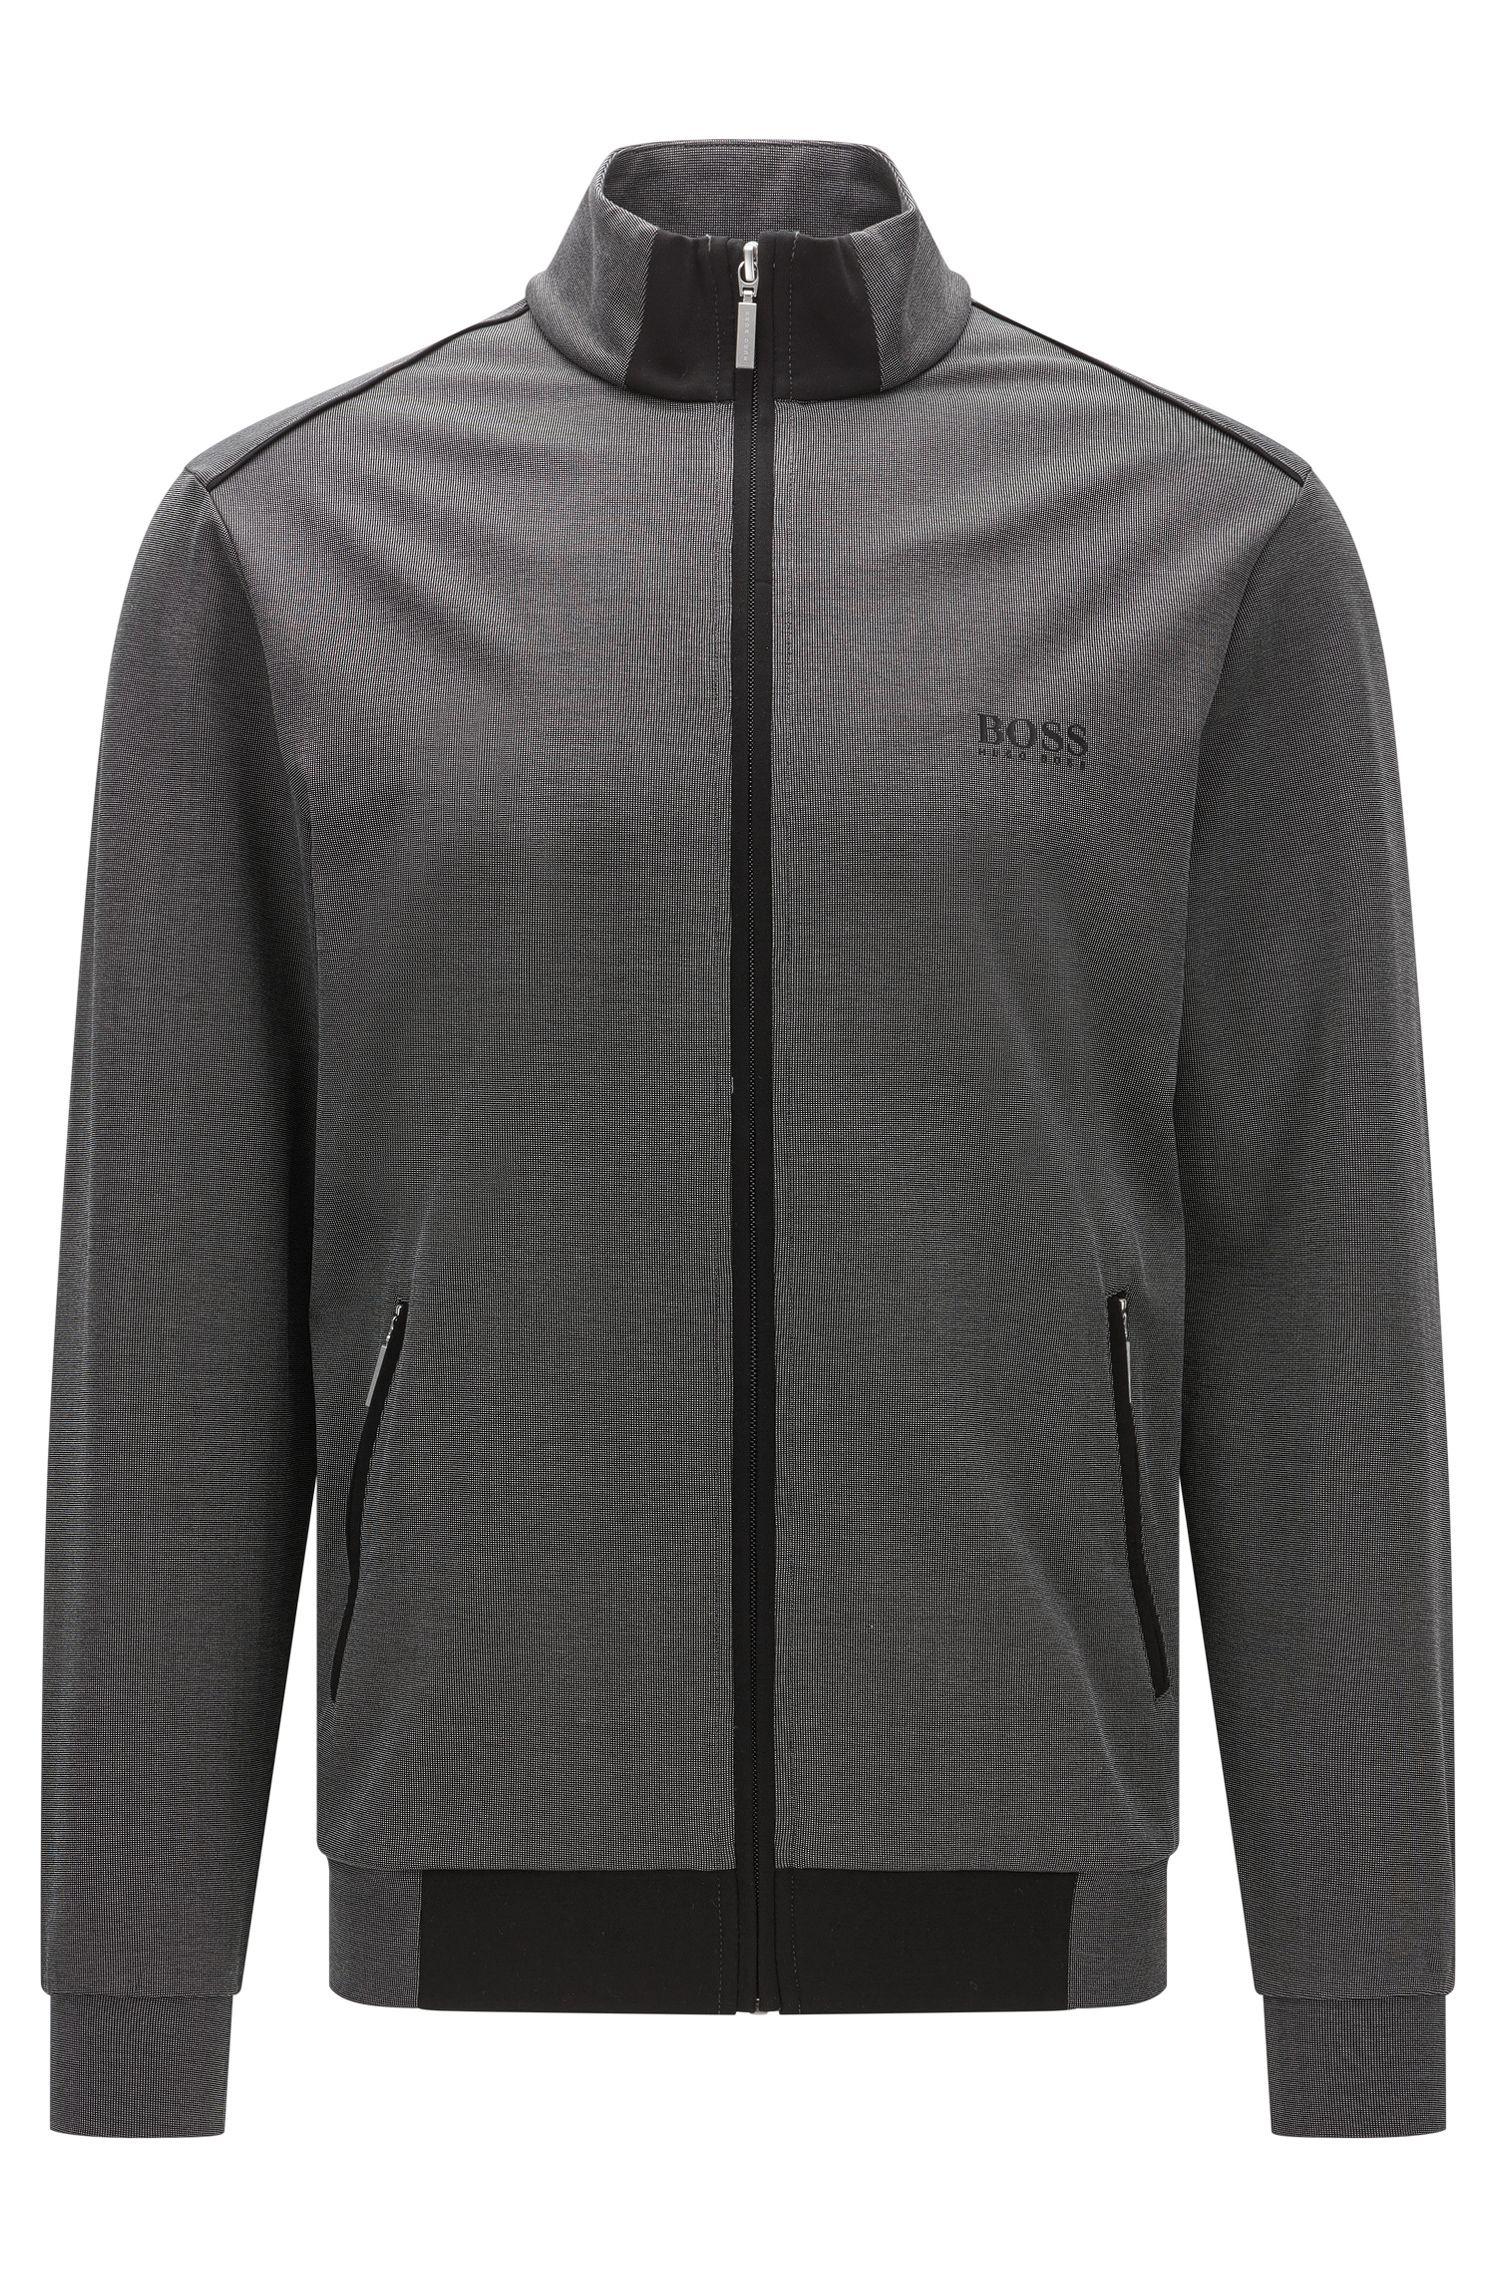 Zip-through jacket in mercerised piqué